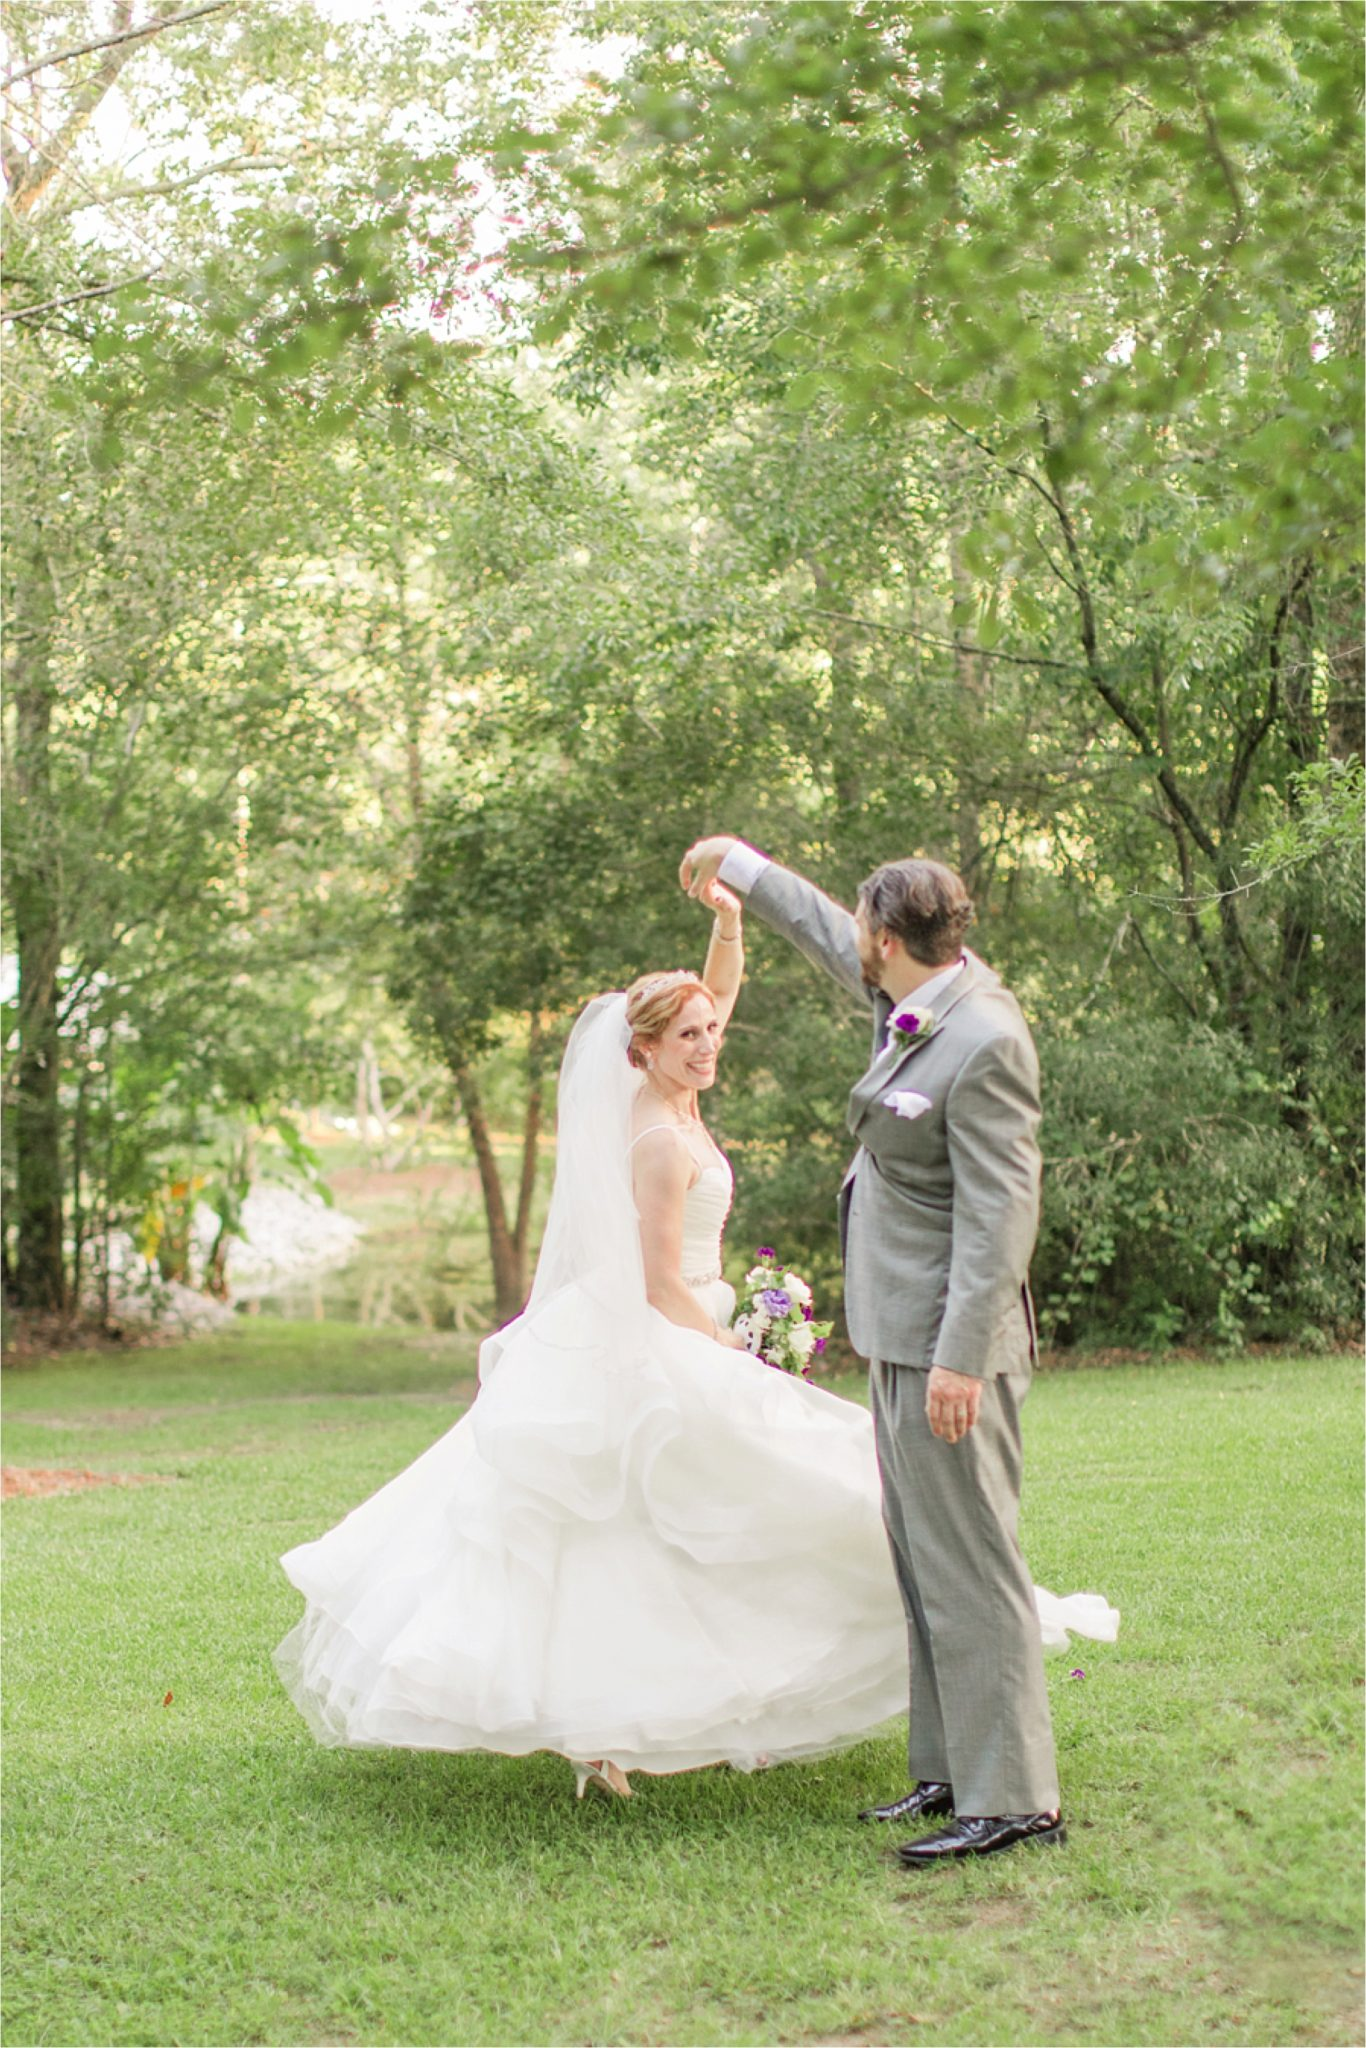 Romantic Destination Wedding Photographer-Bella Sera Gardens-Sarra + Matt-Bridal photography-Bride and groom-Purple themed wedding-Alabama wedding-Alabama photographer